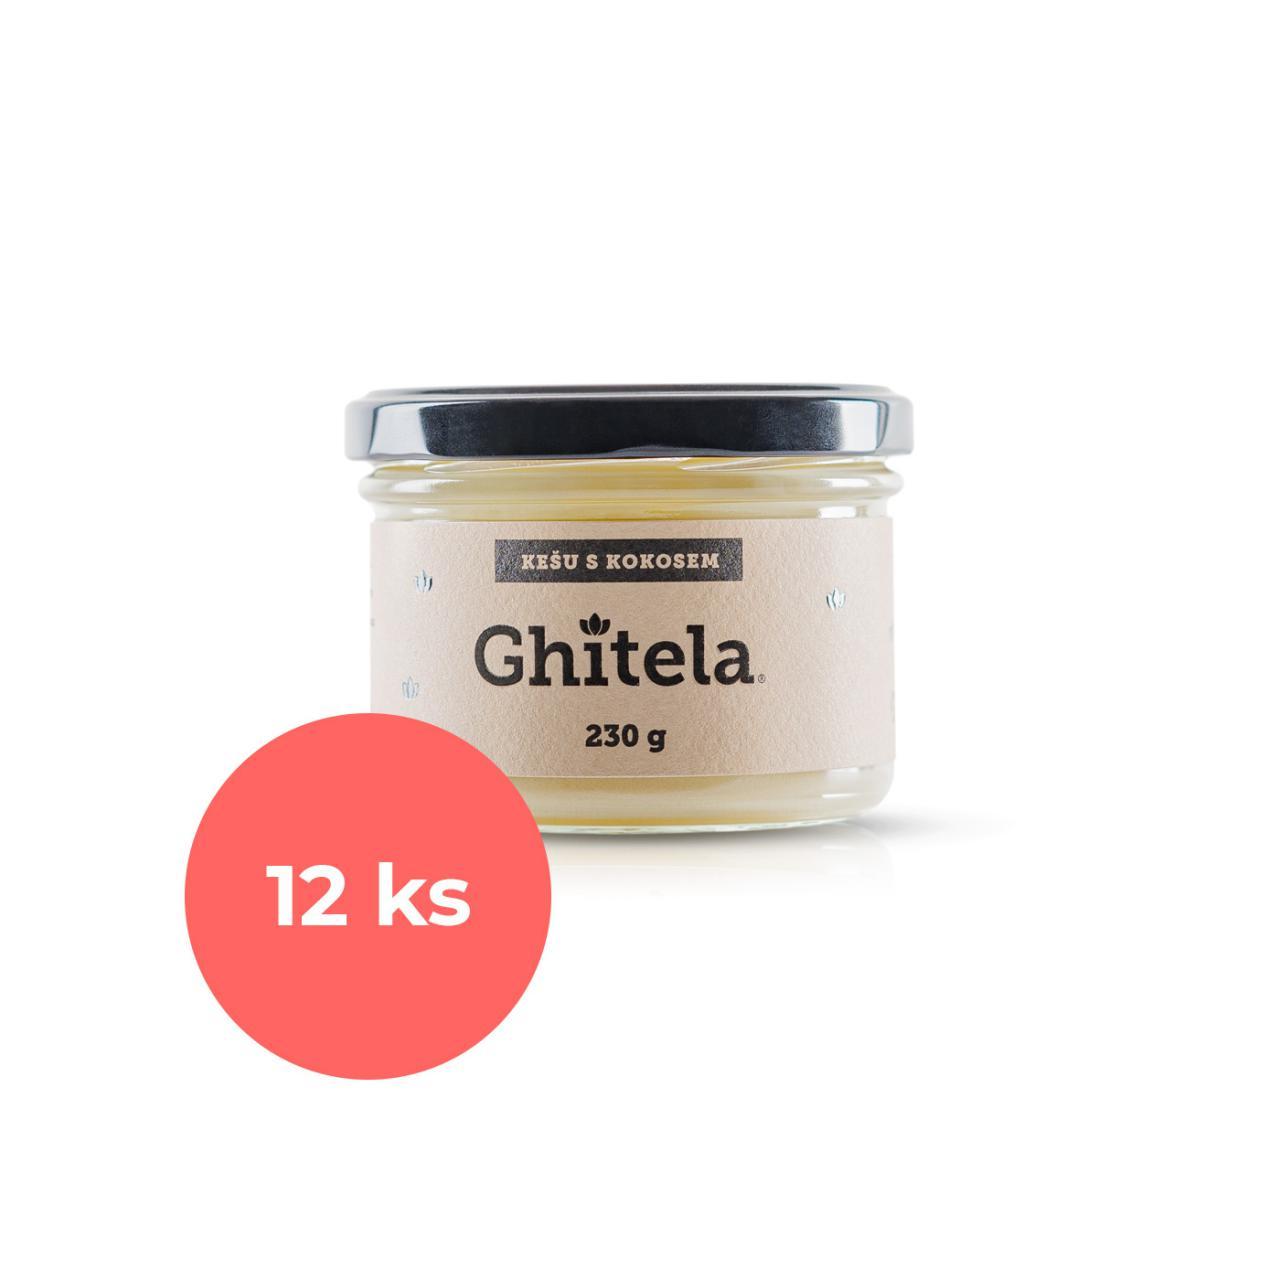 Ghitela® 230g kešu & kokos - karton 12ks